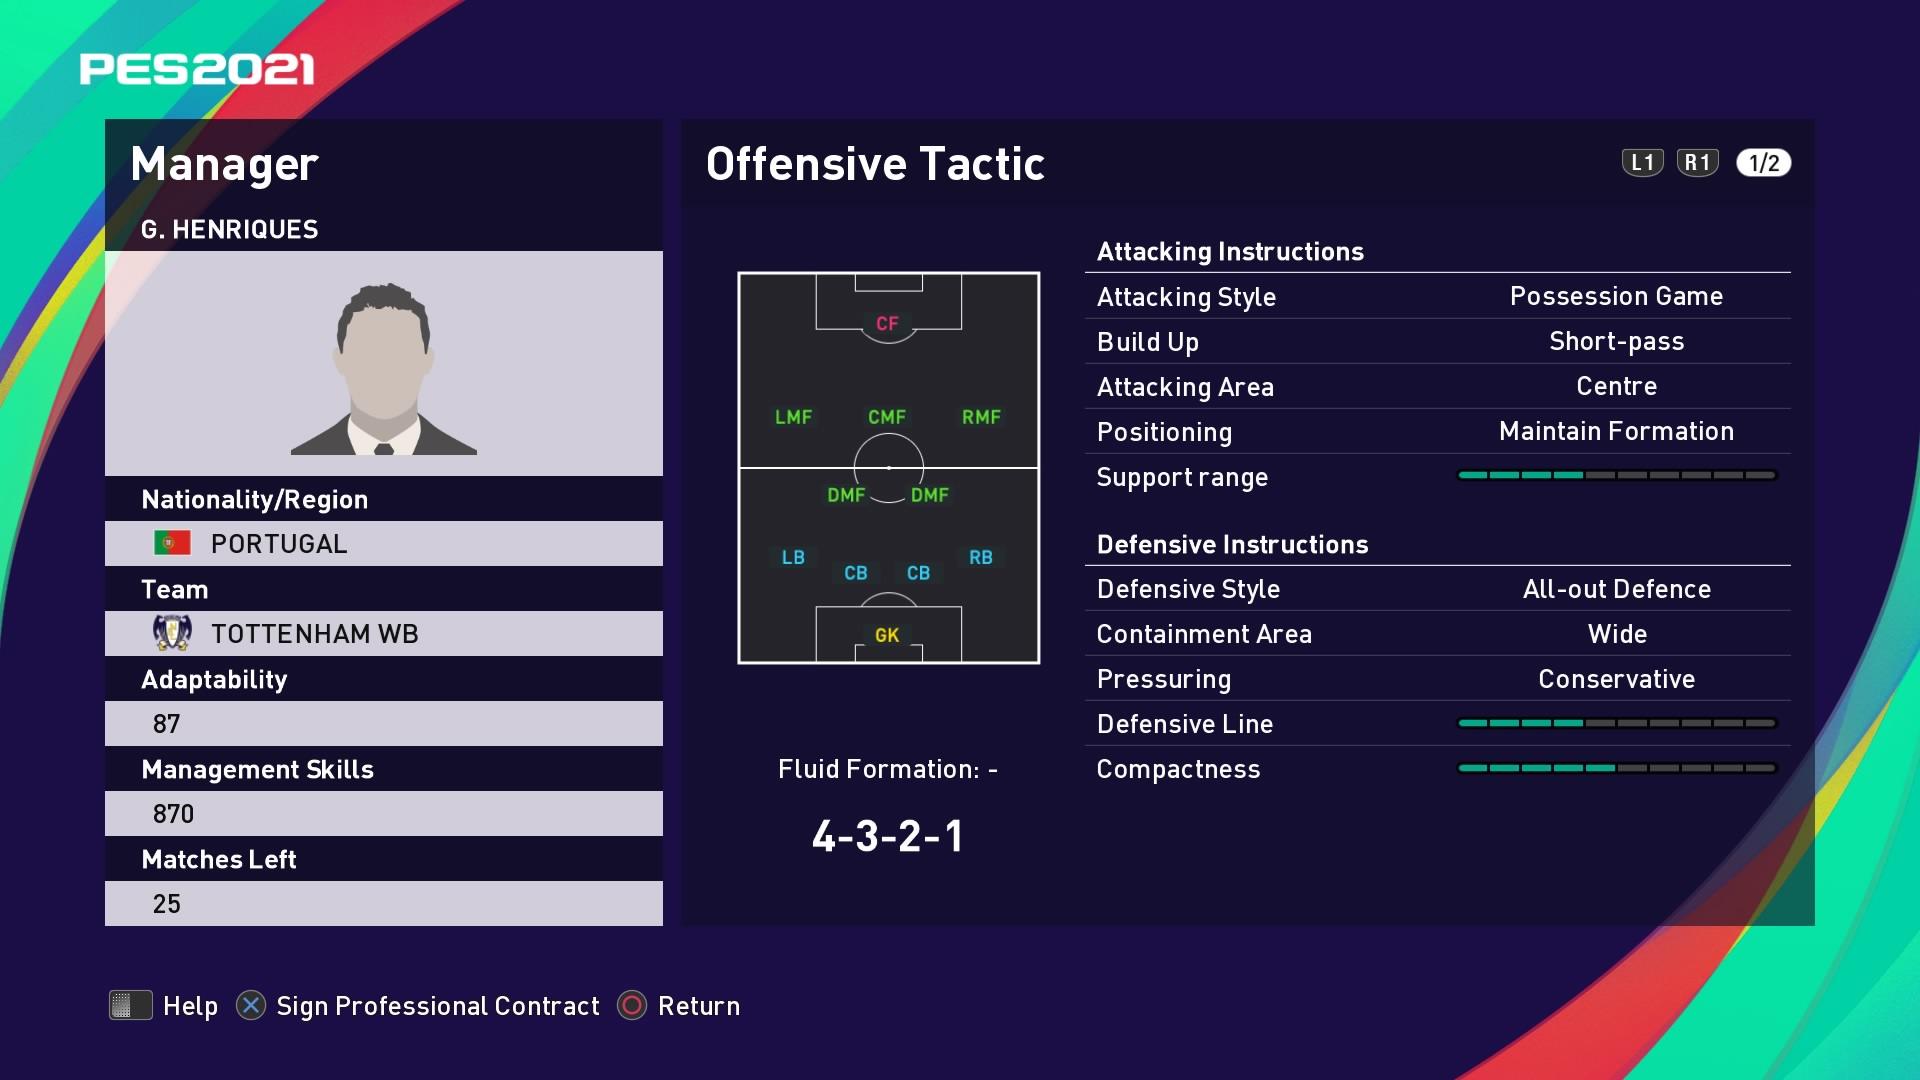 G. Henriques (José Mourinho) Offensive Tactic in PES 2021 myClub